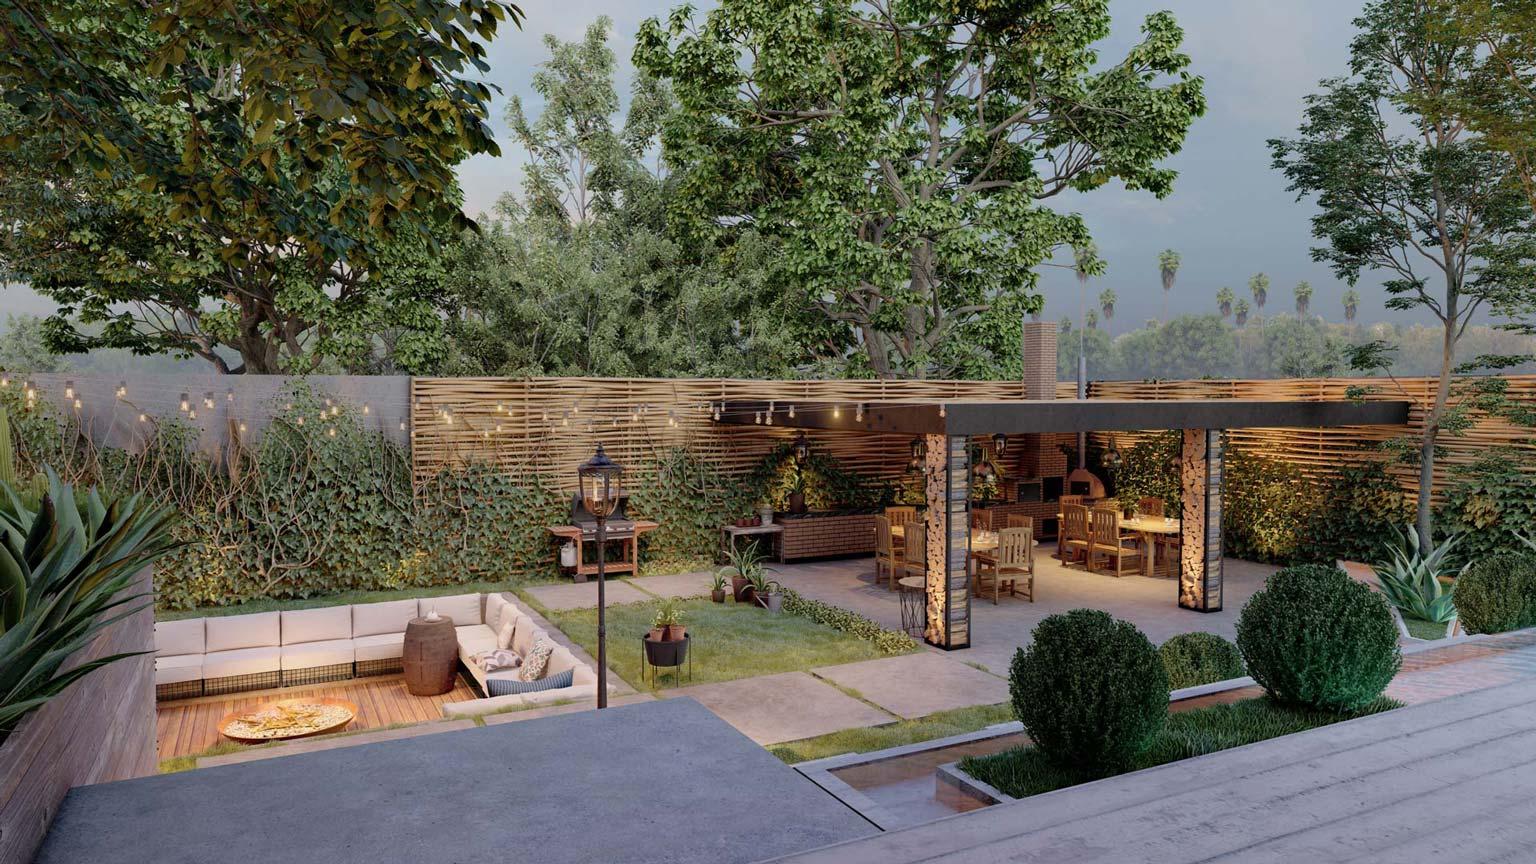 Interior Design, Exterior Rendering | Lumion Architectural Software